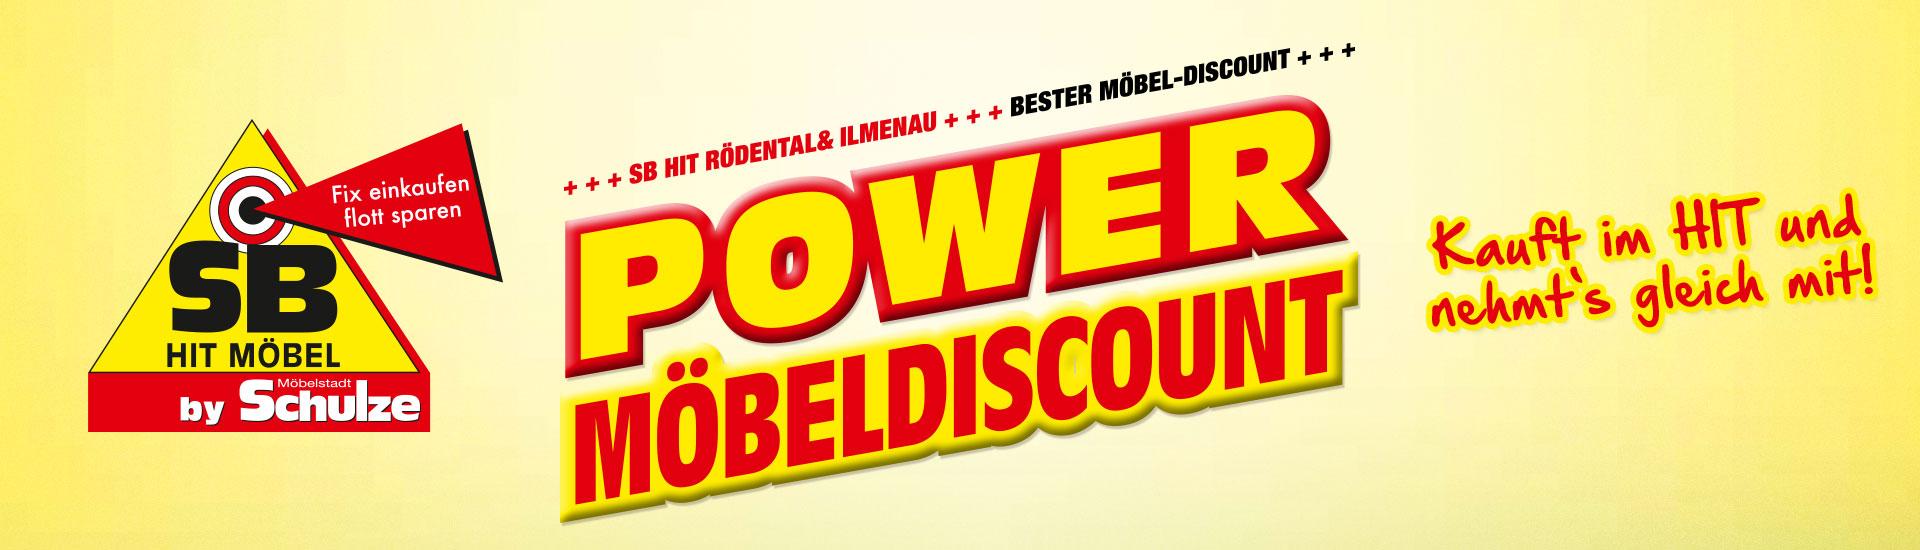 Fabulous Mbelhaus Sonntag Nrw With Mbelhaus Sonntag Nrw With Mbel Meyerhoff